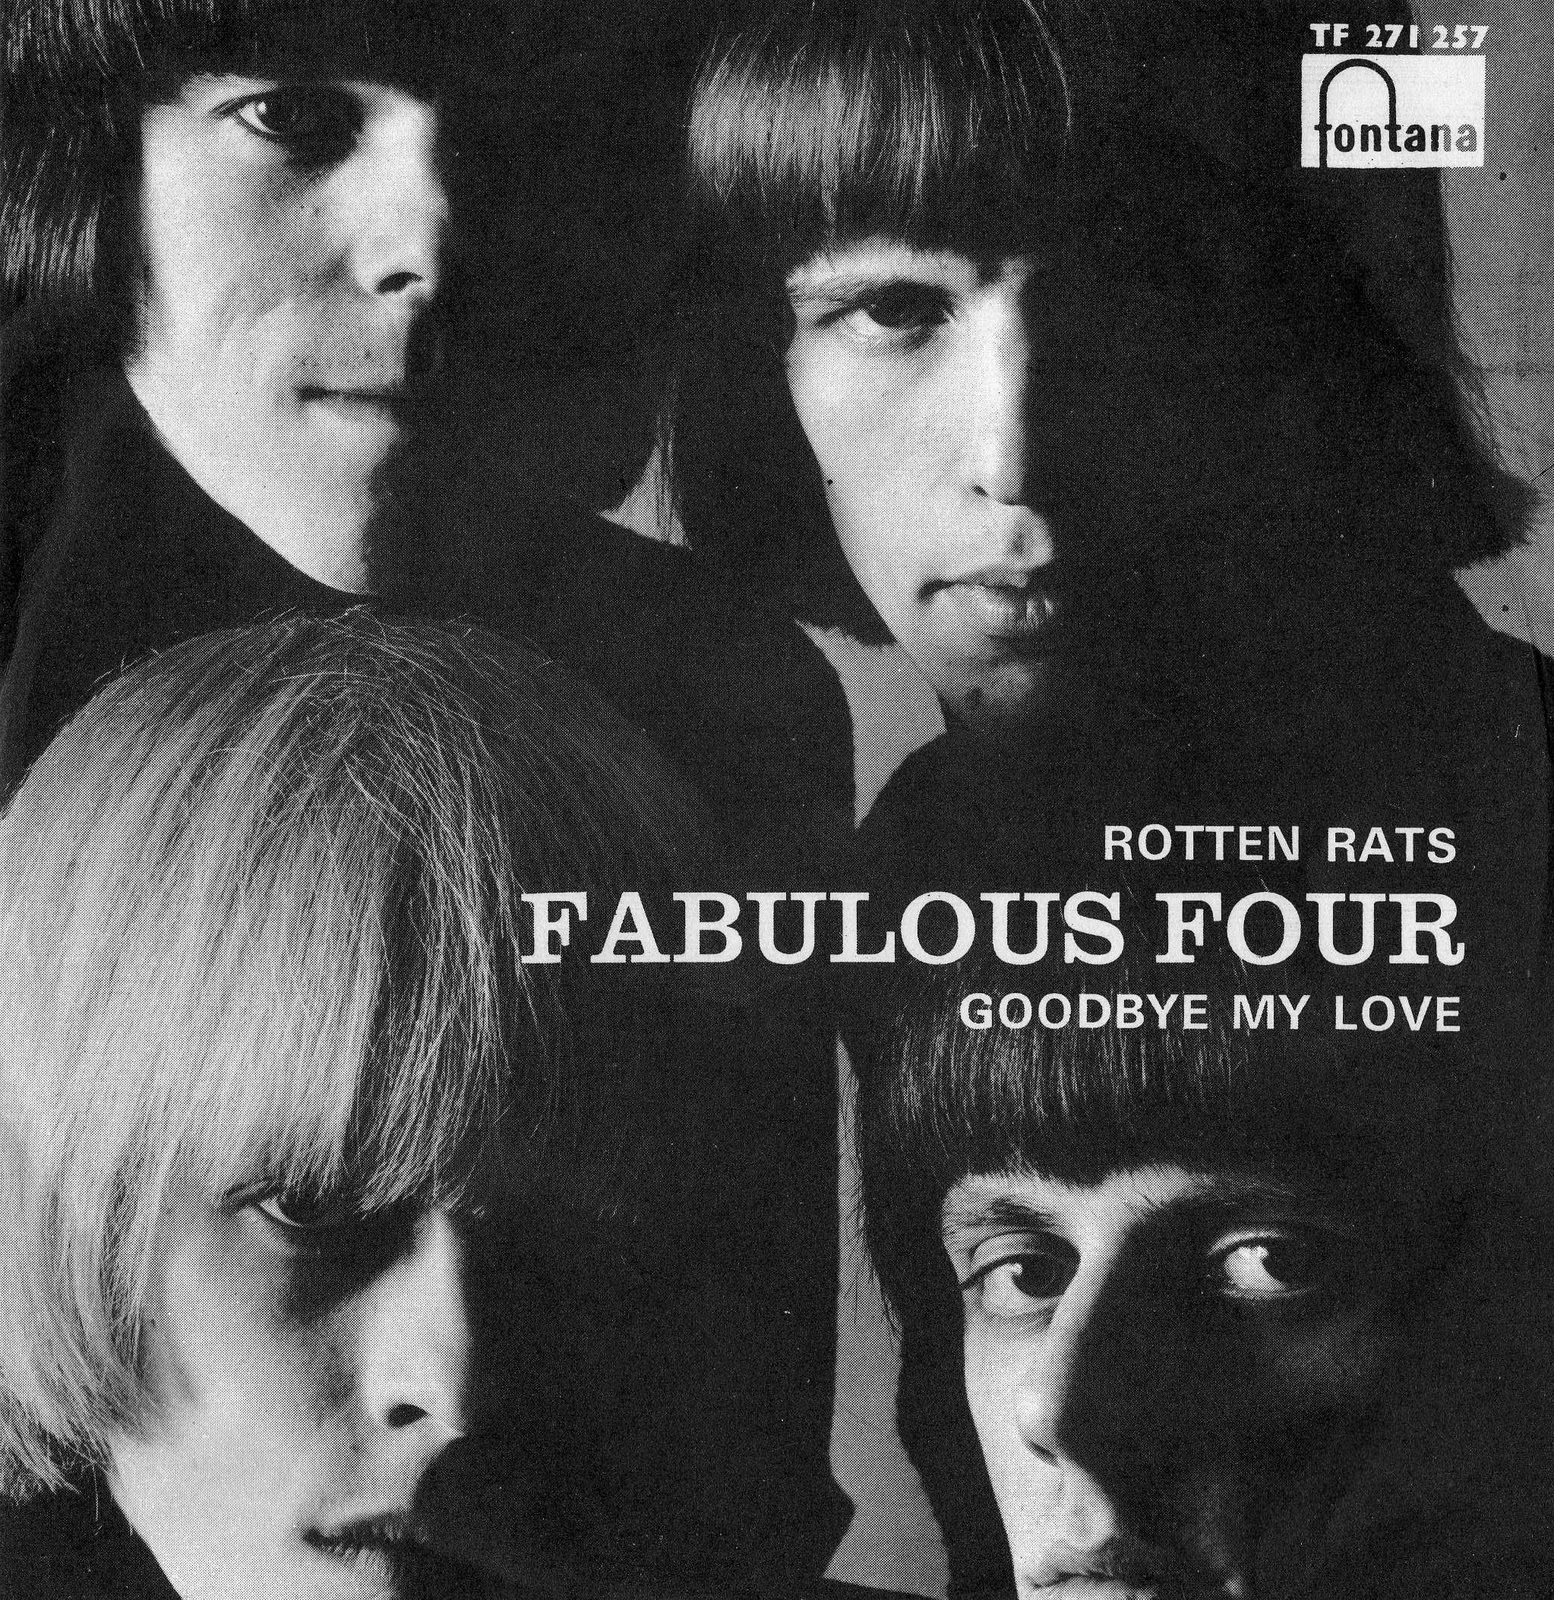 Fabulous Four Rotten Rats